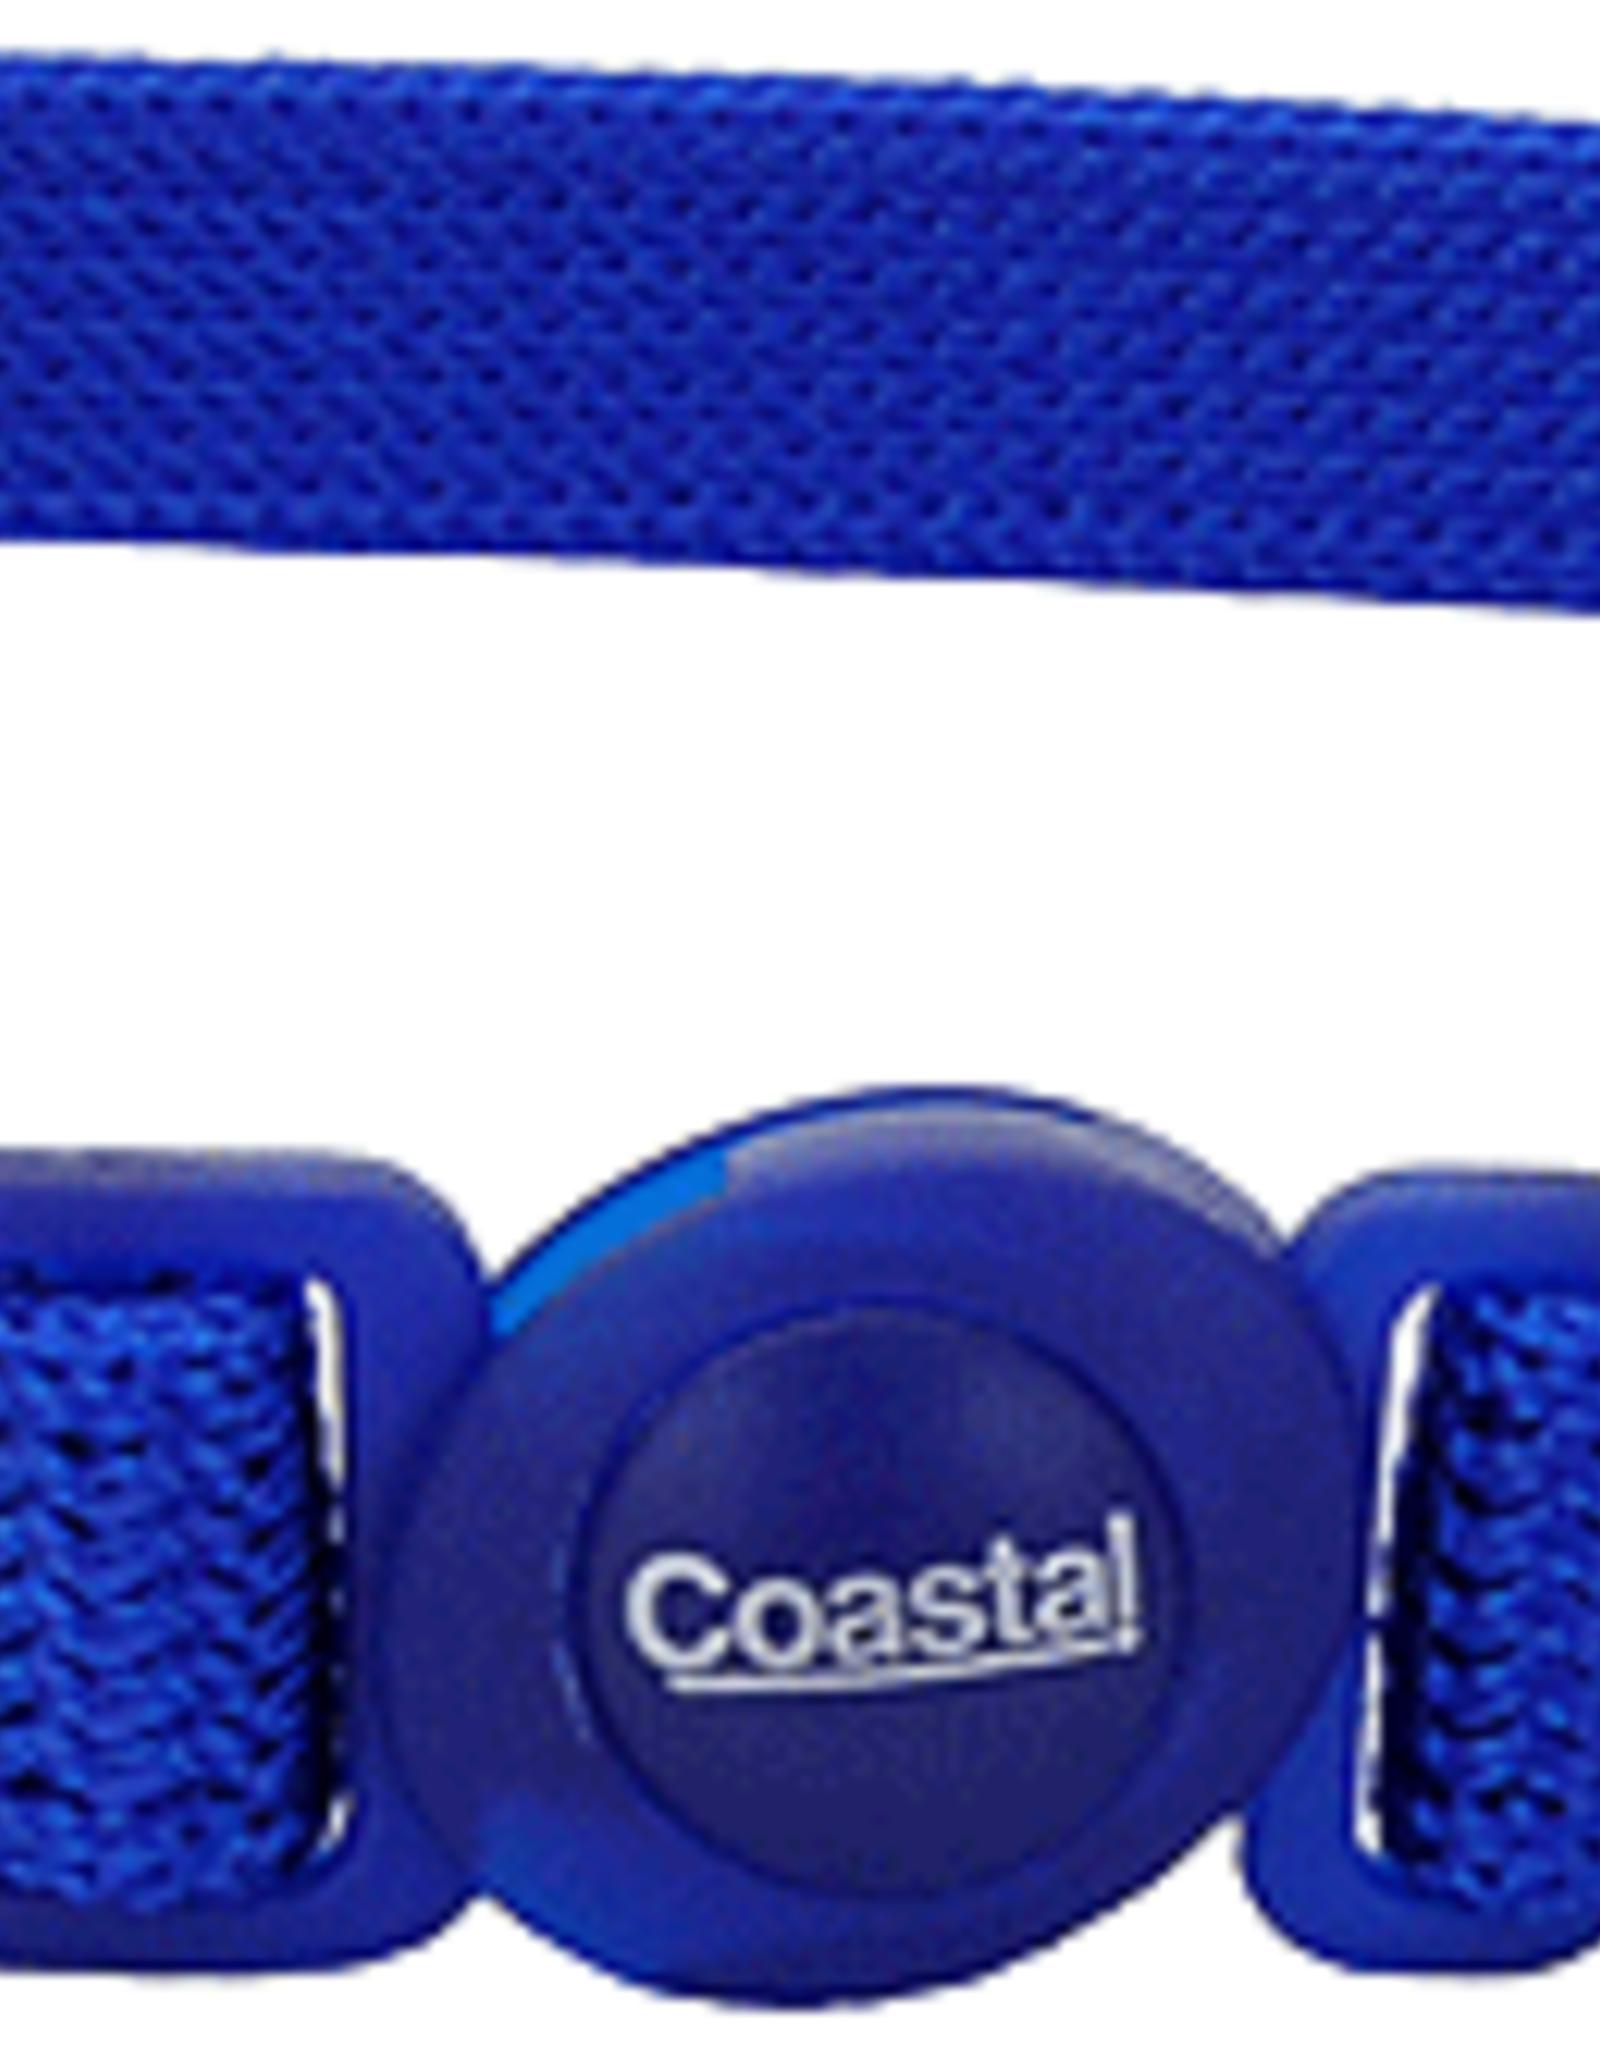 Coastal Cat Collar Blue